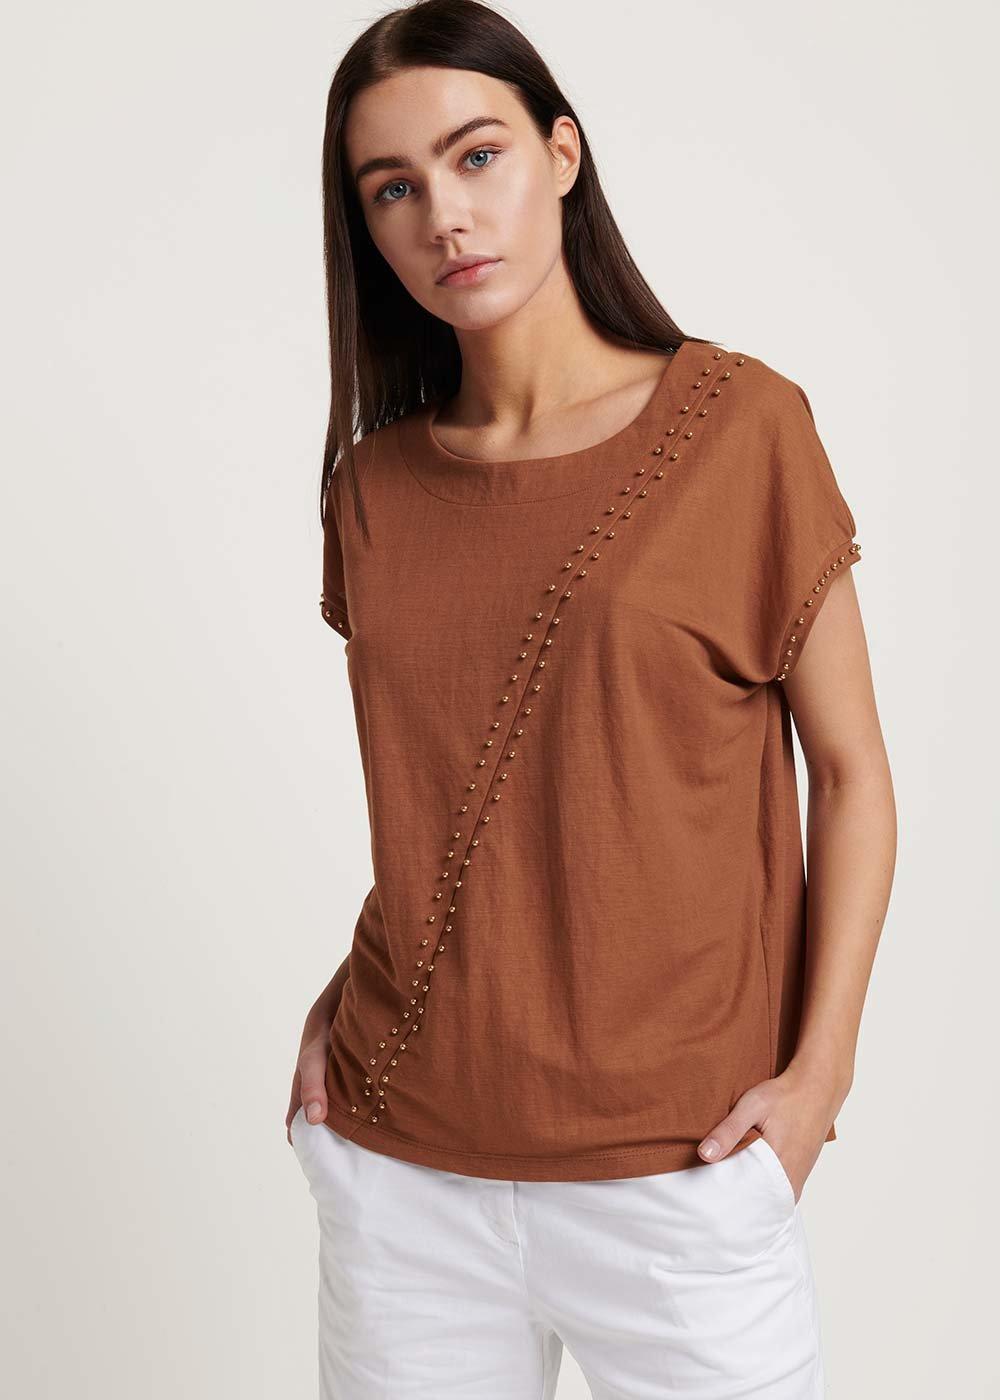 Sabina T-shirt with micro studs - Cocoa - Woman